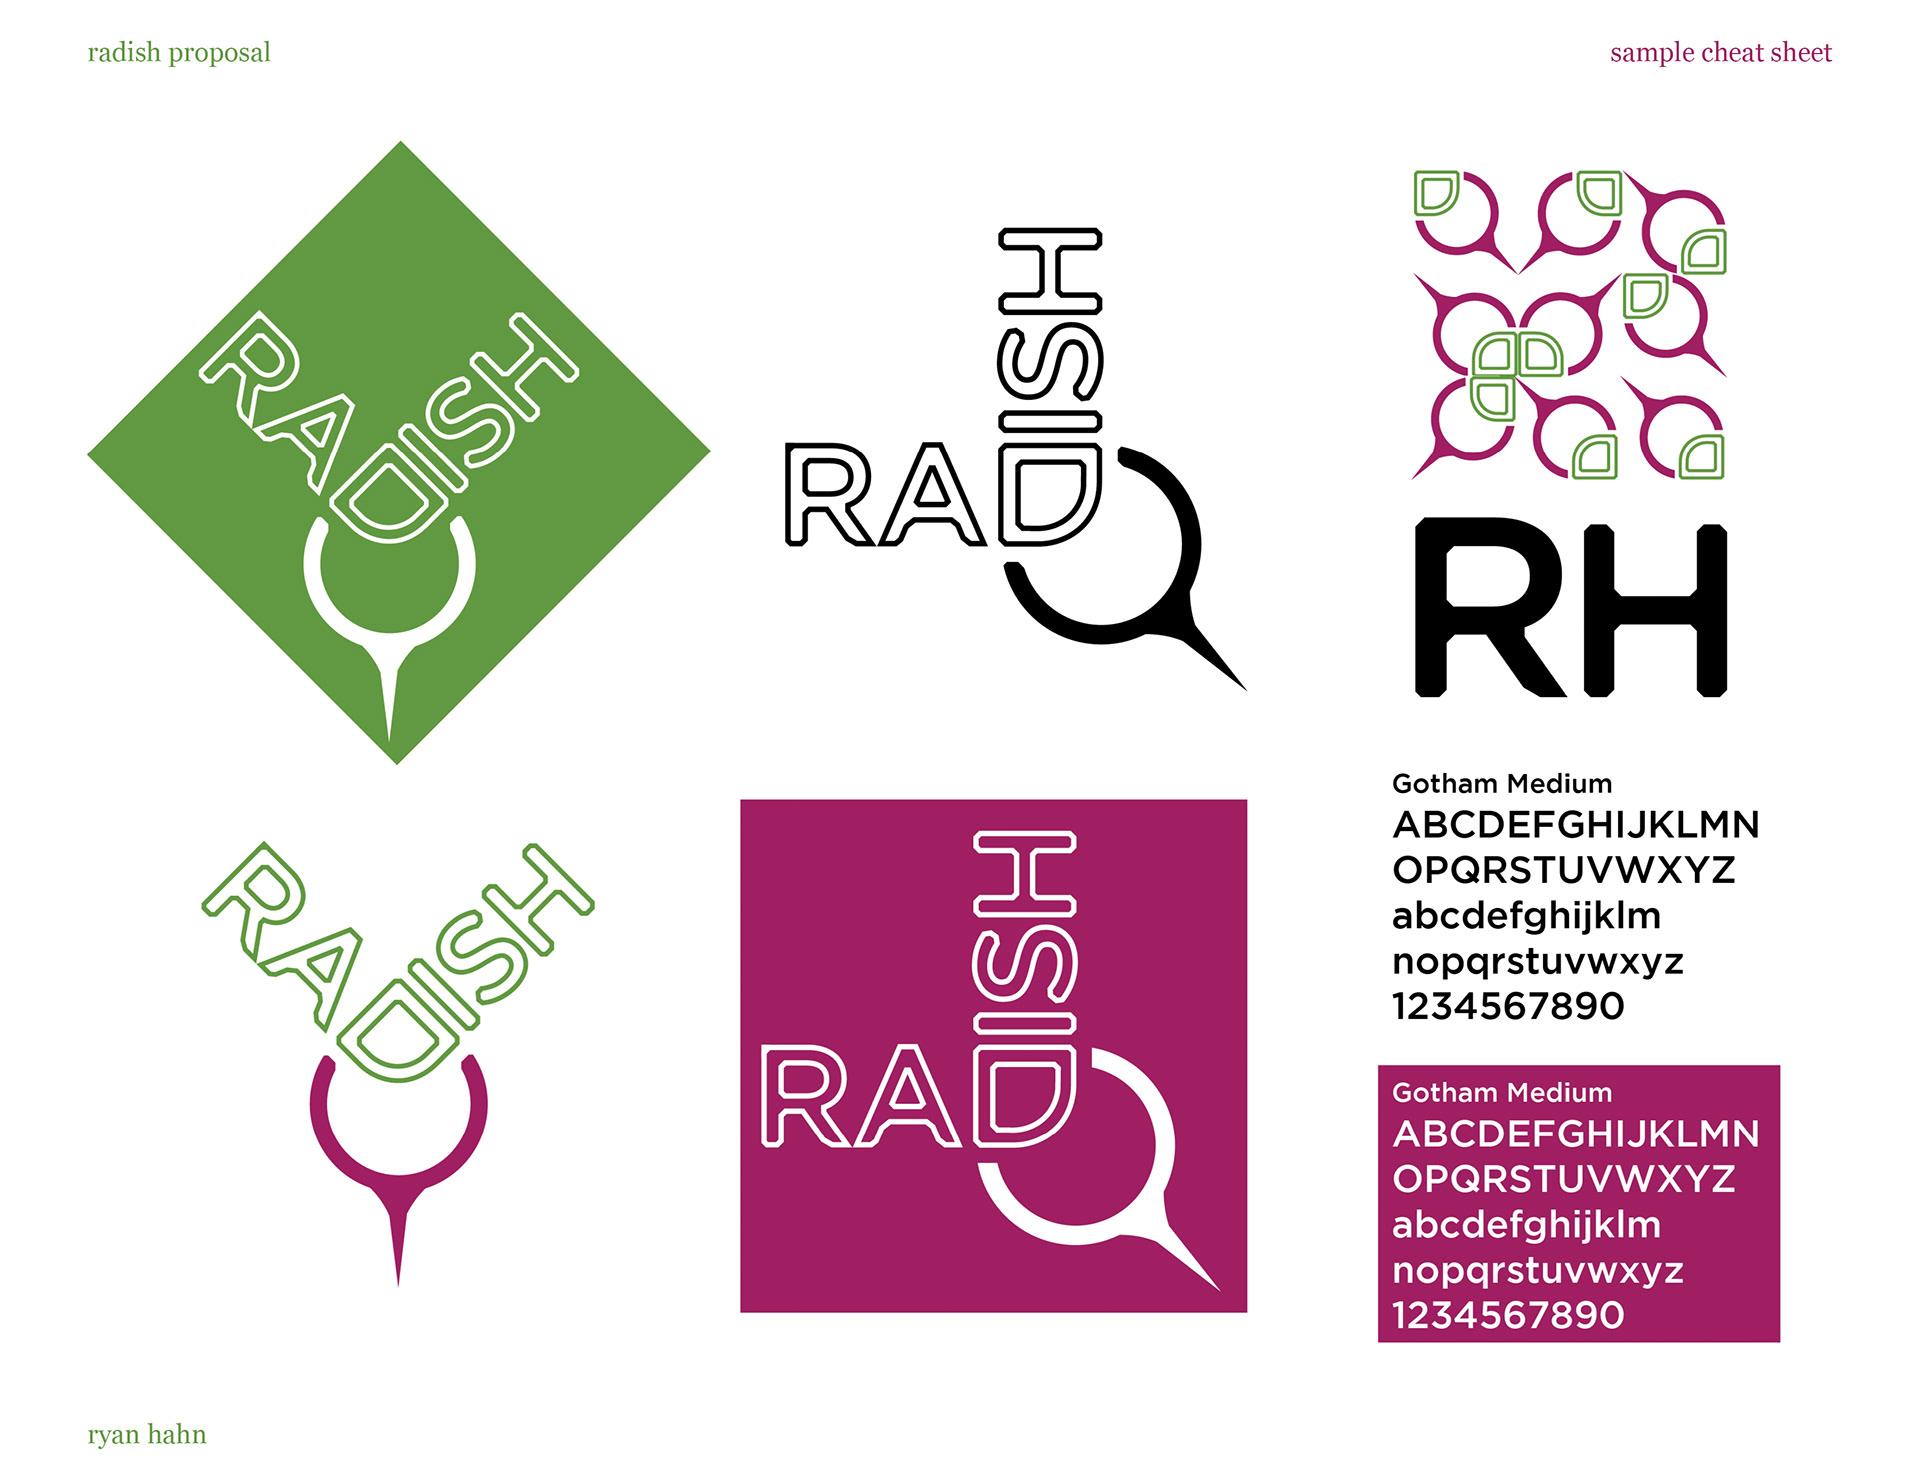 Ryan Hahn - Radish